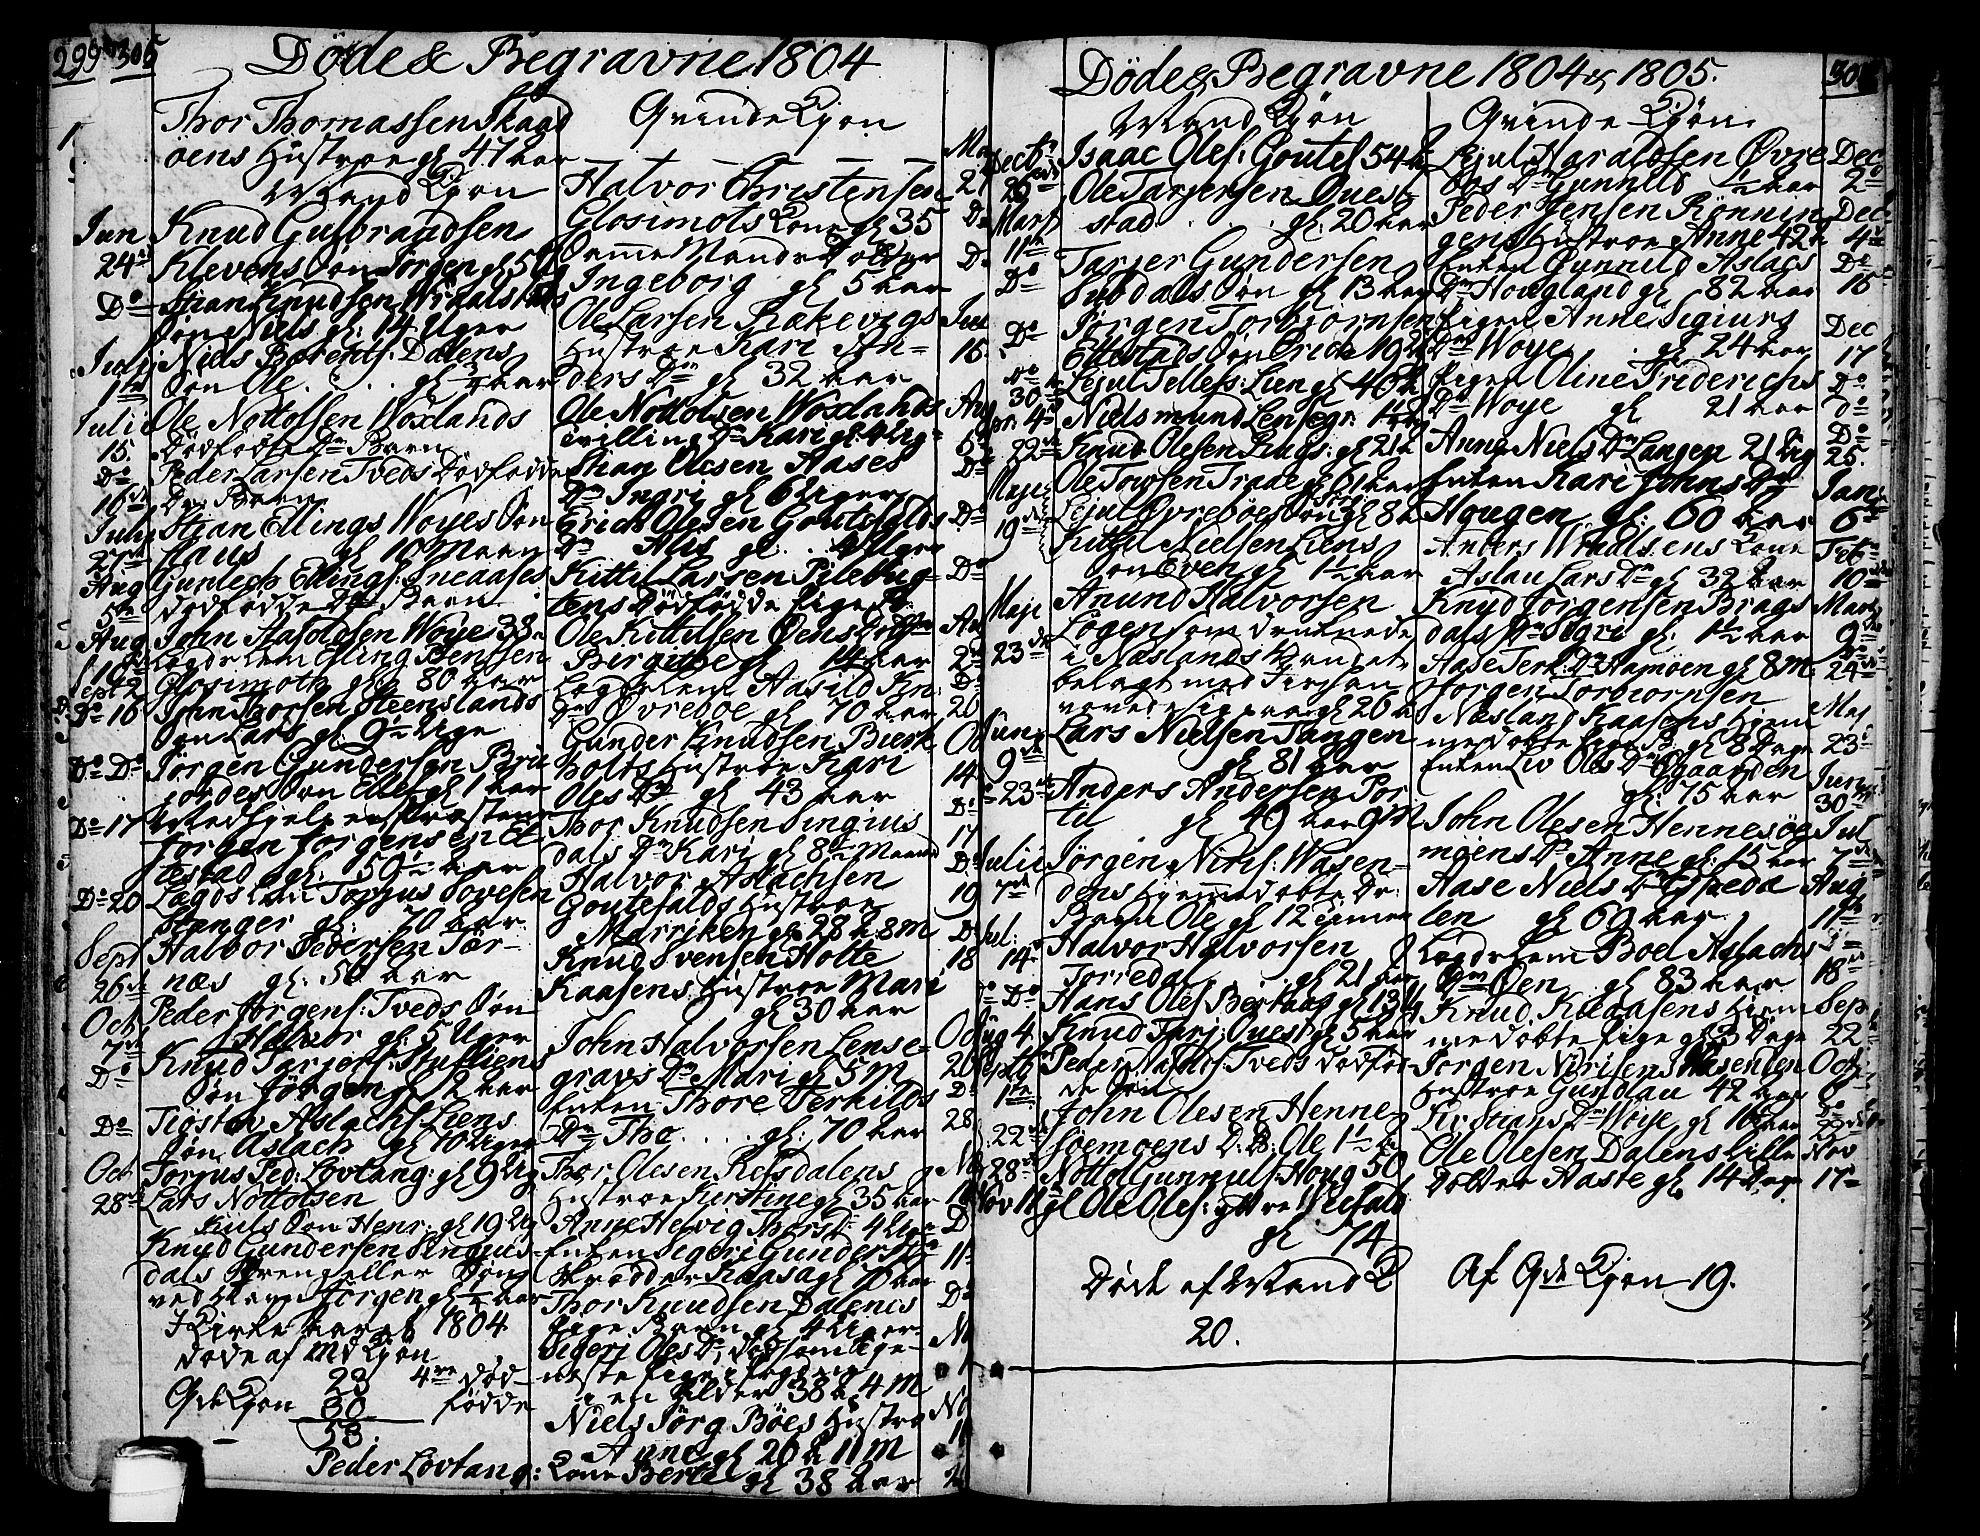 SAKO, Drangedal kirkebøker, F/Fa/L0003: Ministerialbok nr. 3, 1768-1814, s. 305-306